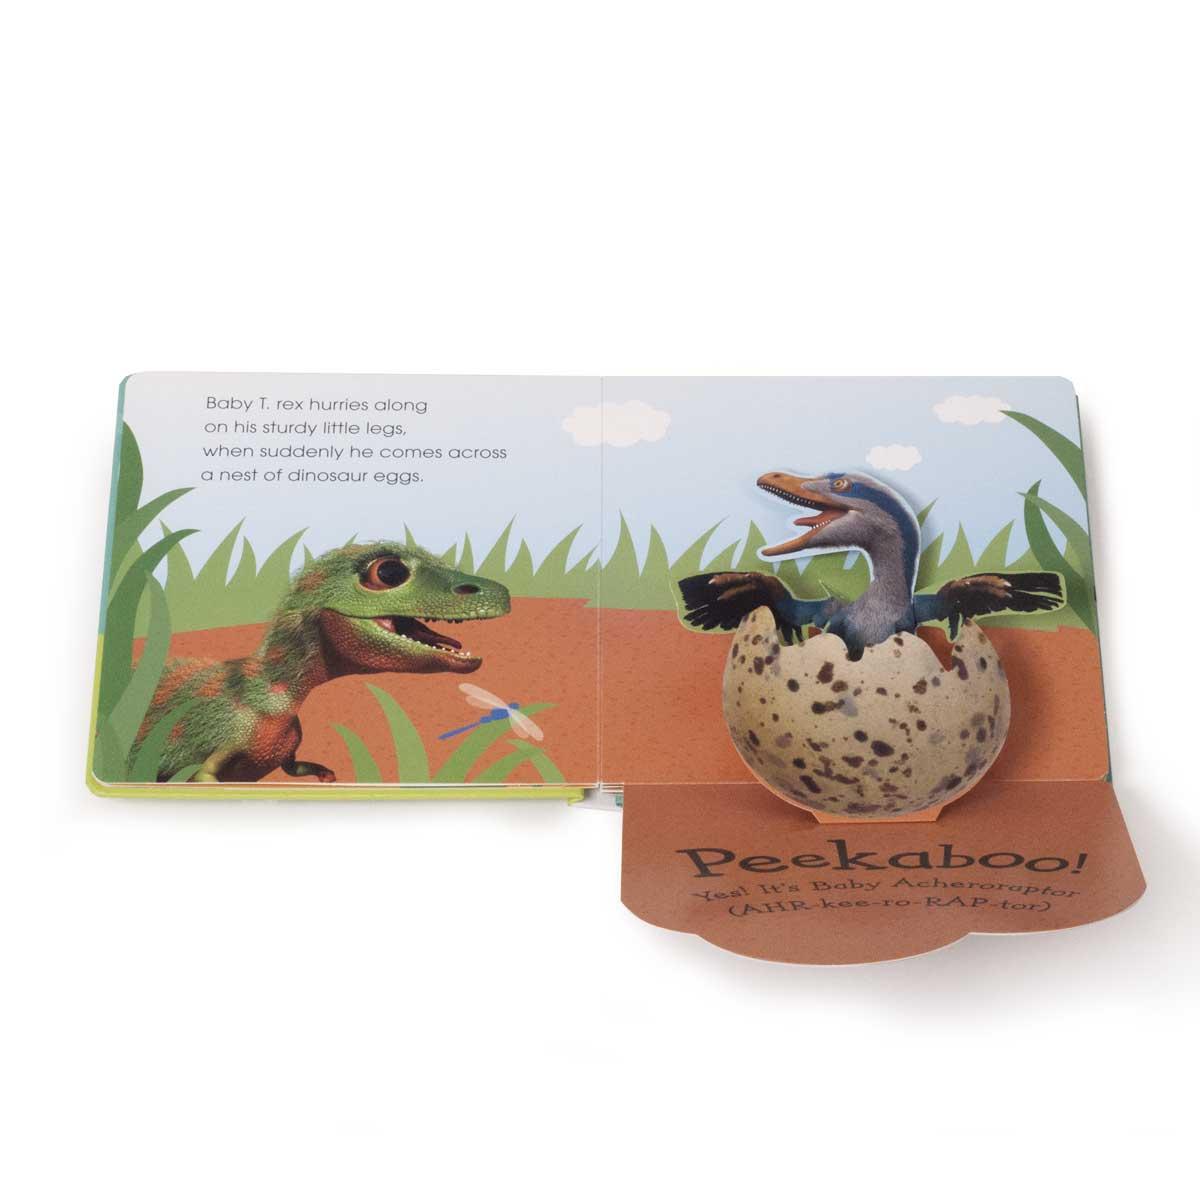 Peekaboo_Baby-Dinosaur_Acheroraptor_open-1200x1200.jpg